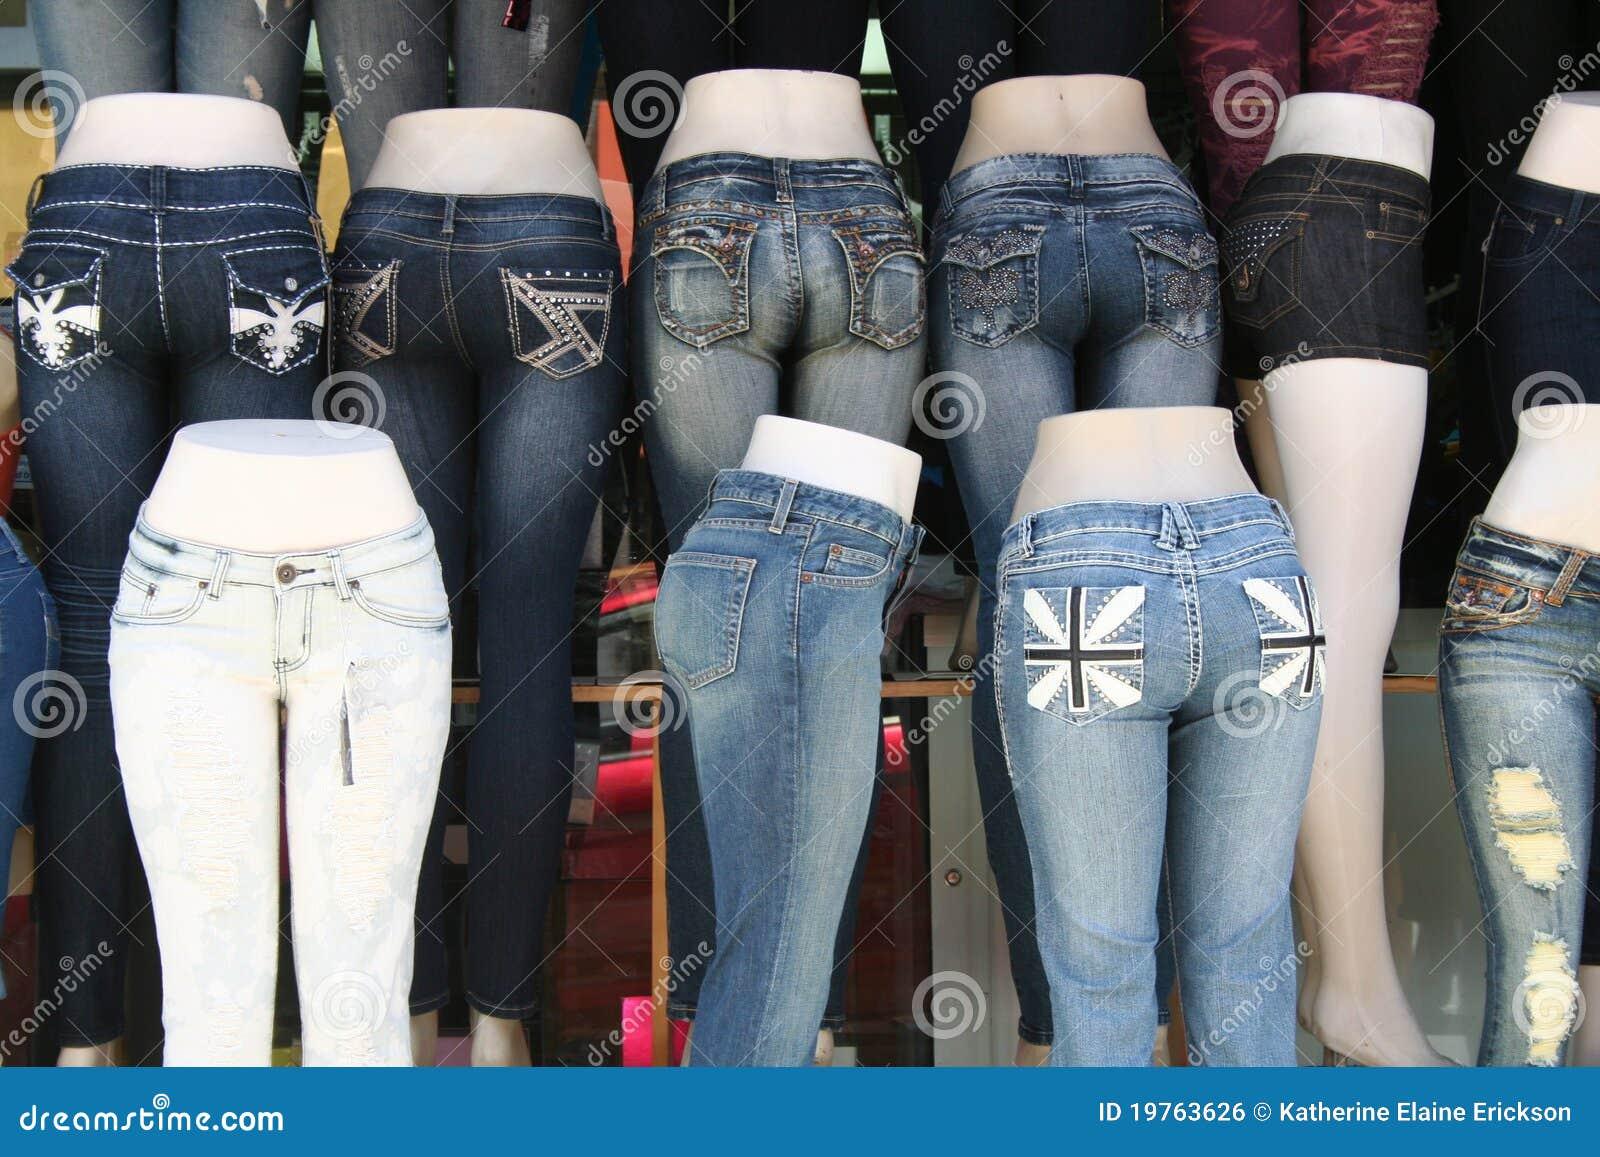 Womens designer jeans